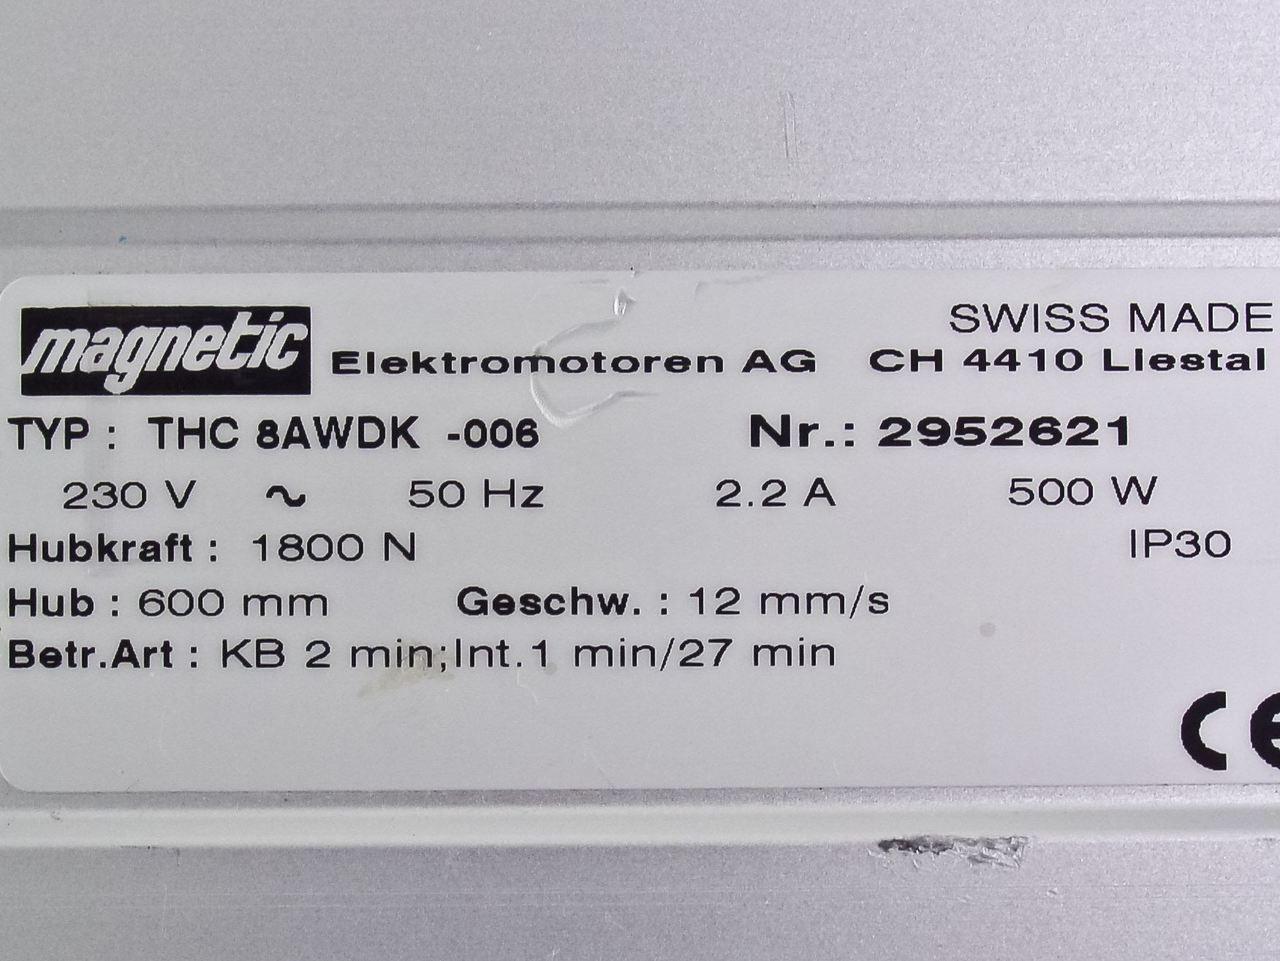 Magnetic Elektromotoren Linear Actuator THC 8AWDK-008 on